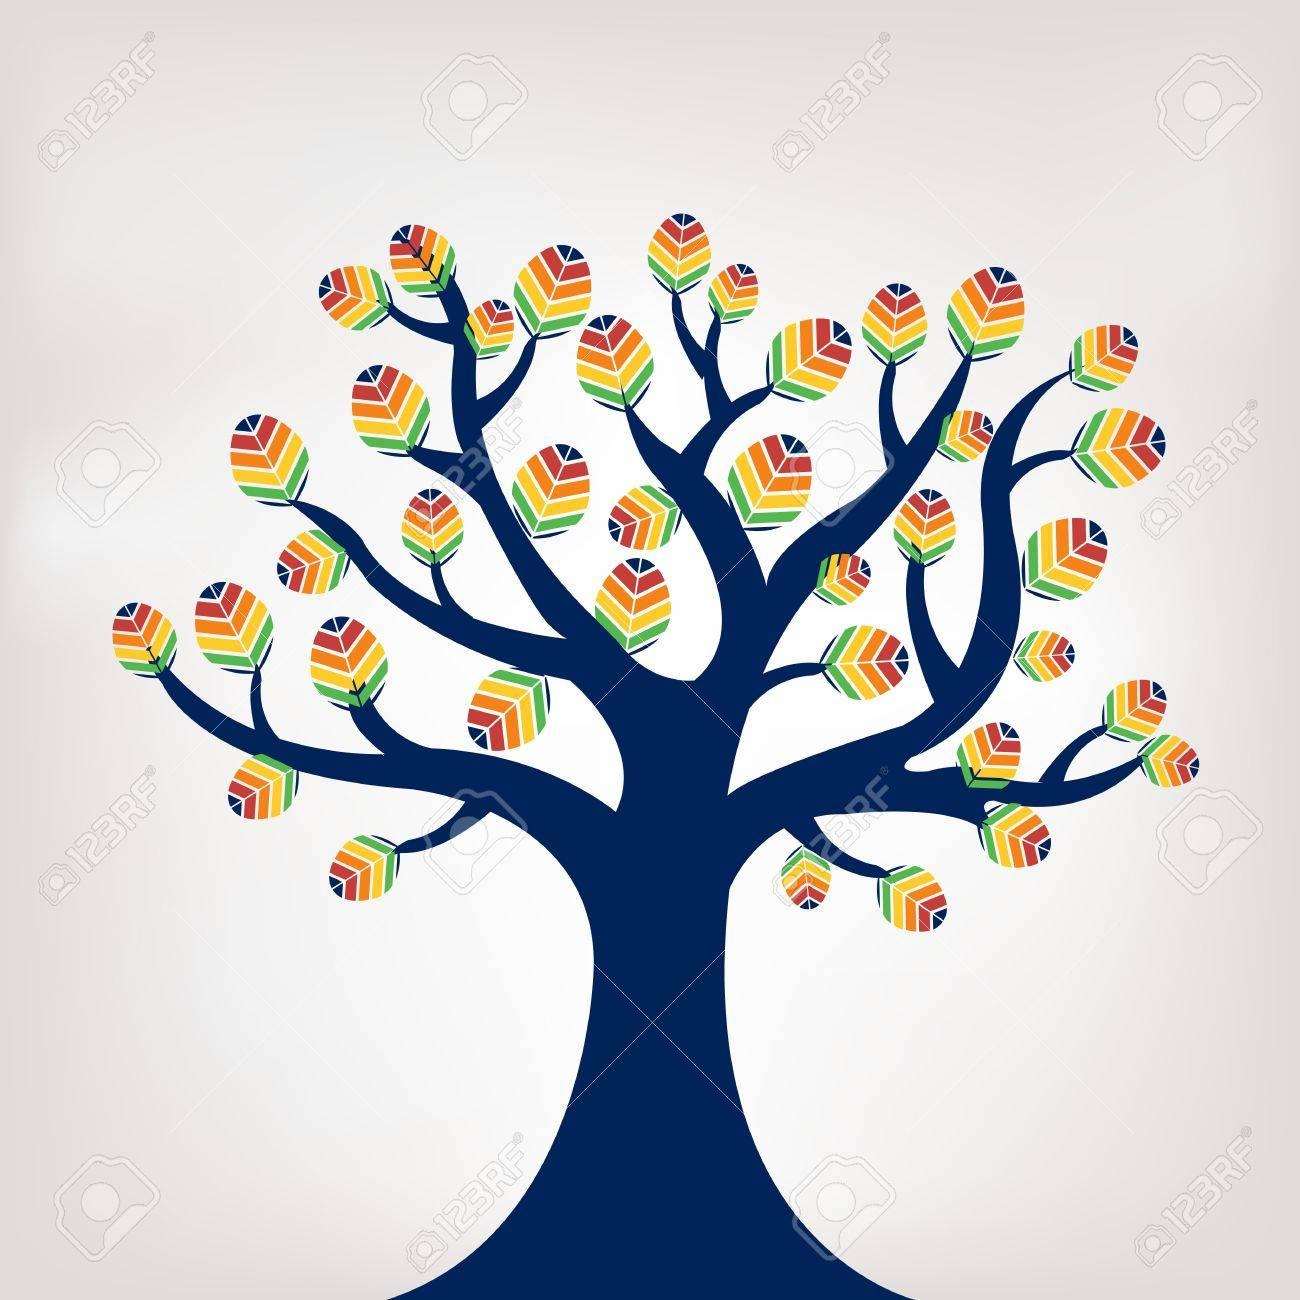 Abstract Tree, Vector Illustration Stock Vector - 9194651